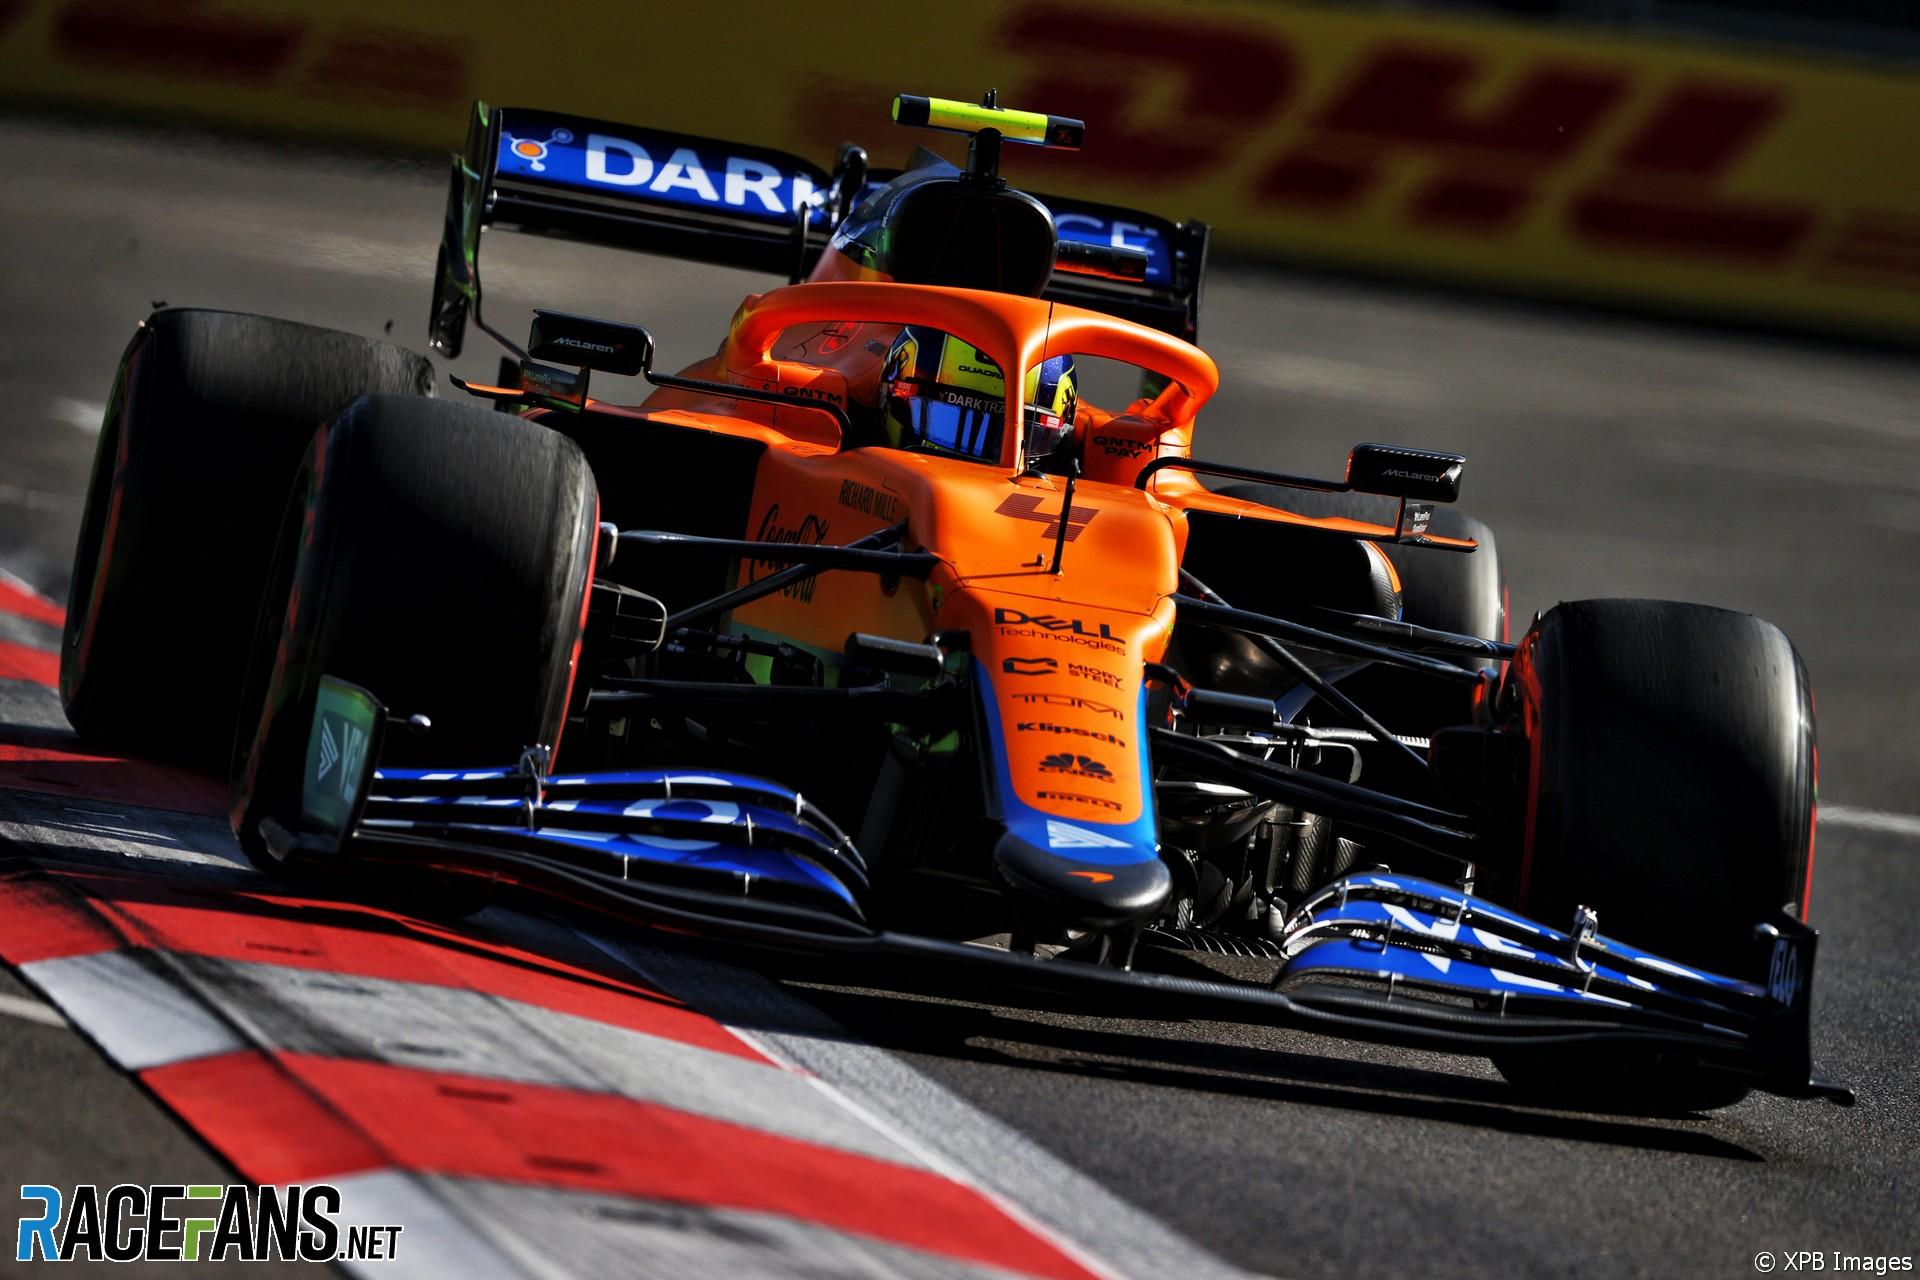 Lando Norris, McLaren, Baku City Circuit, 2021